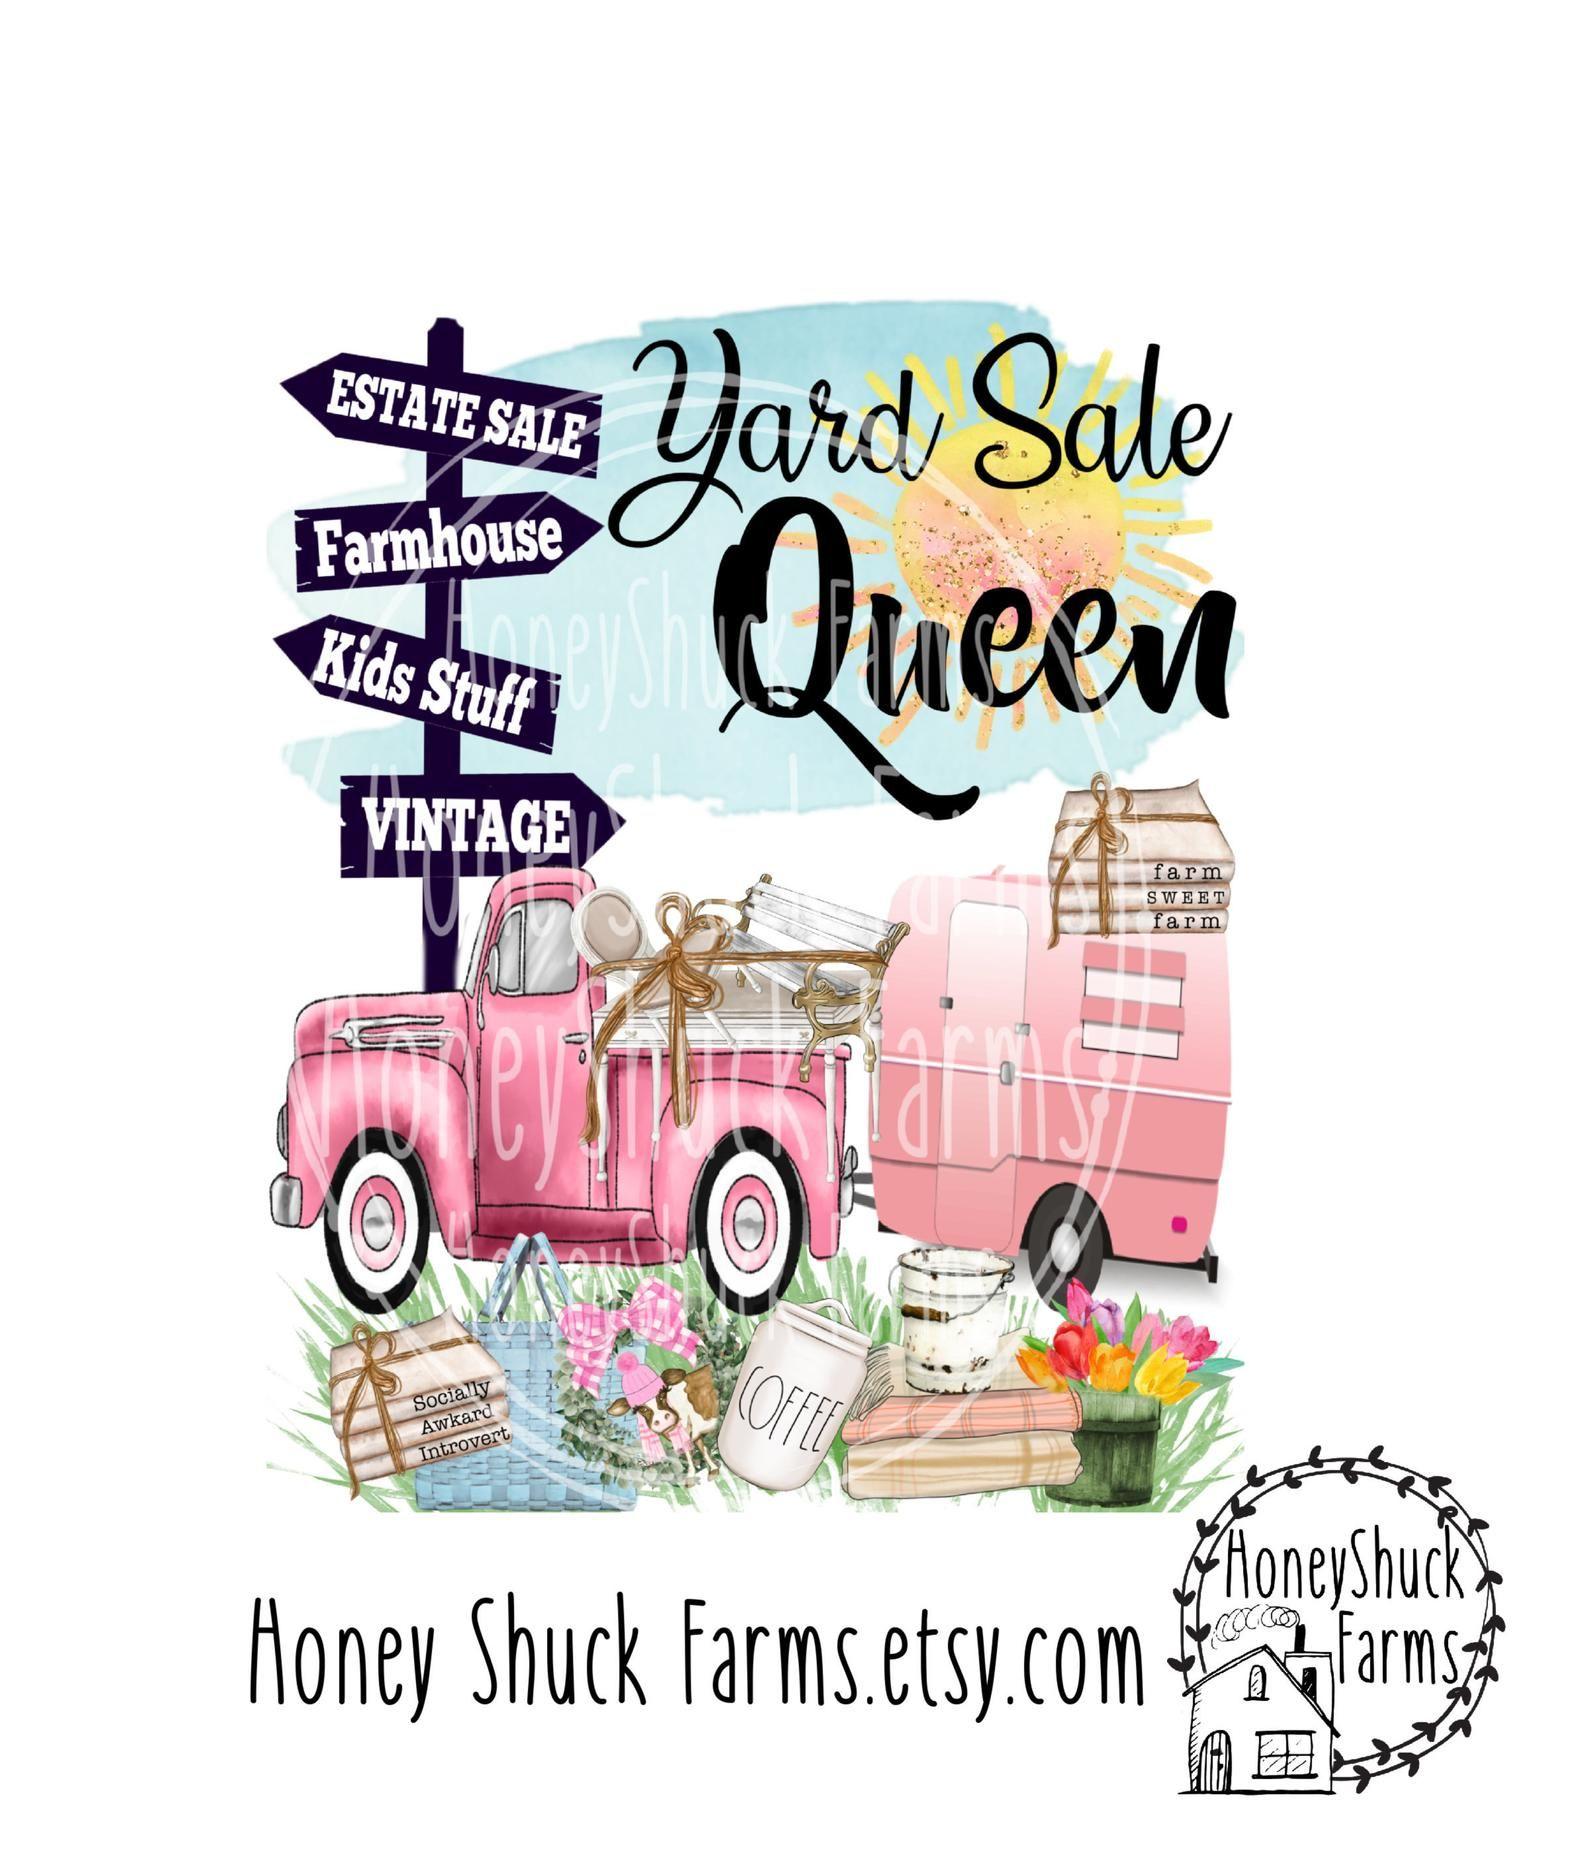 Yard Sale Queen Digital Download Truck And Camper Yard Sale Etsy Yard Sale Digital Making Shirts